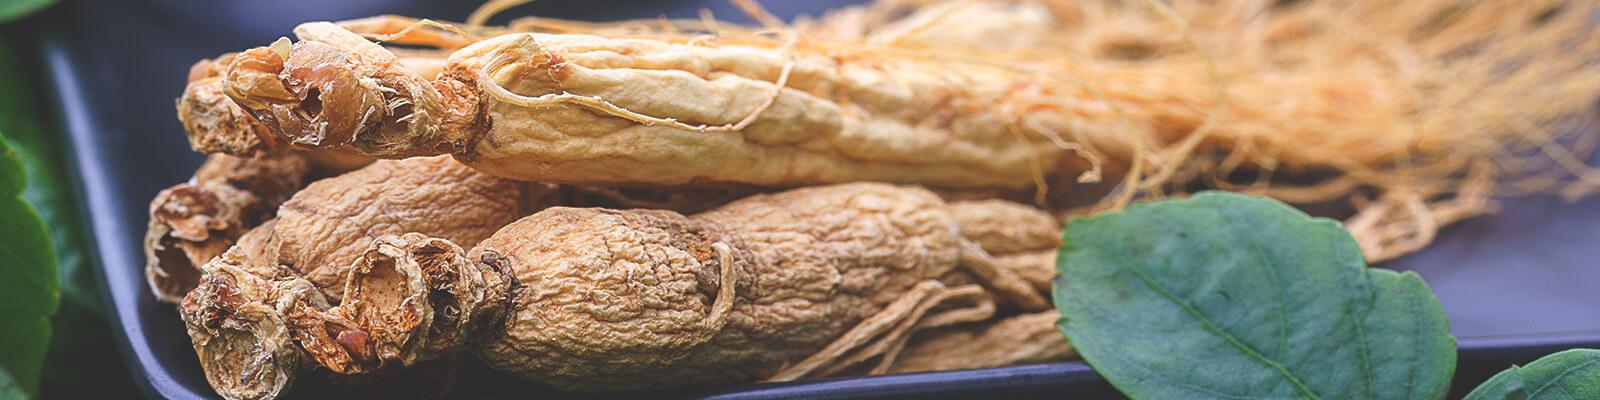 8 Amazing Health Benefits Of Ginseng - Ben's Natural Health